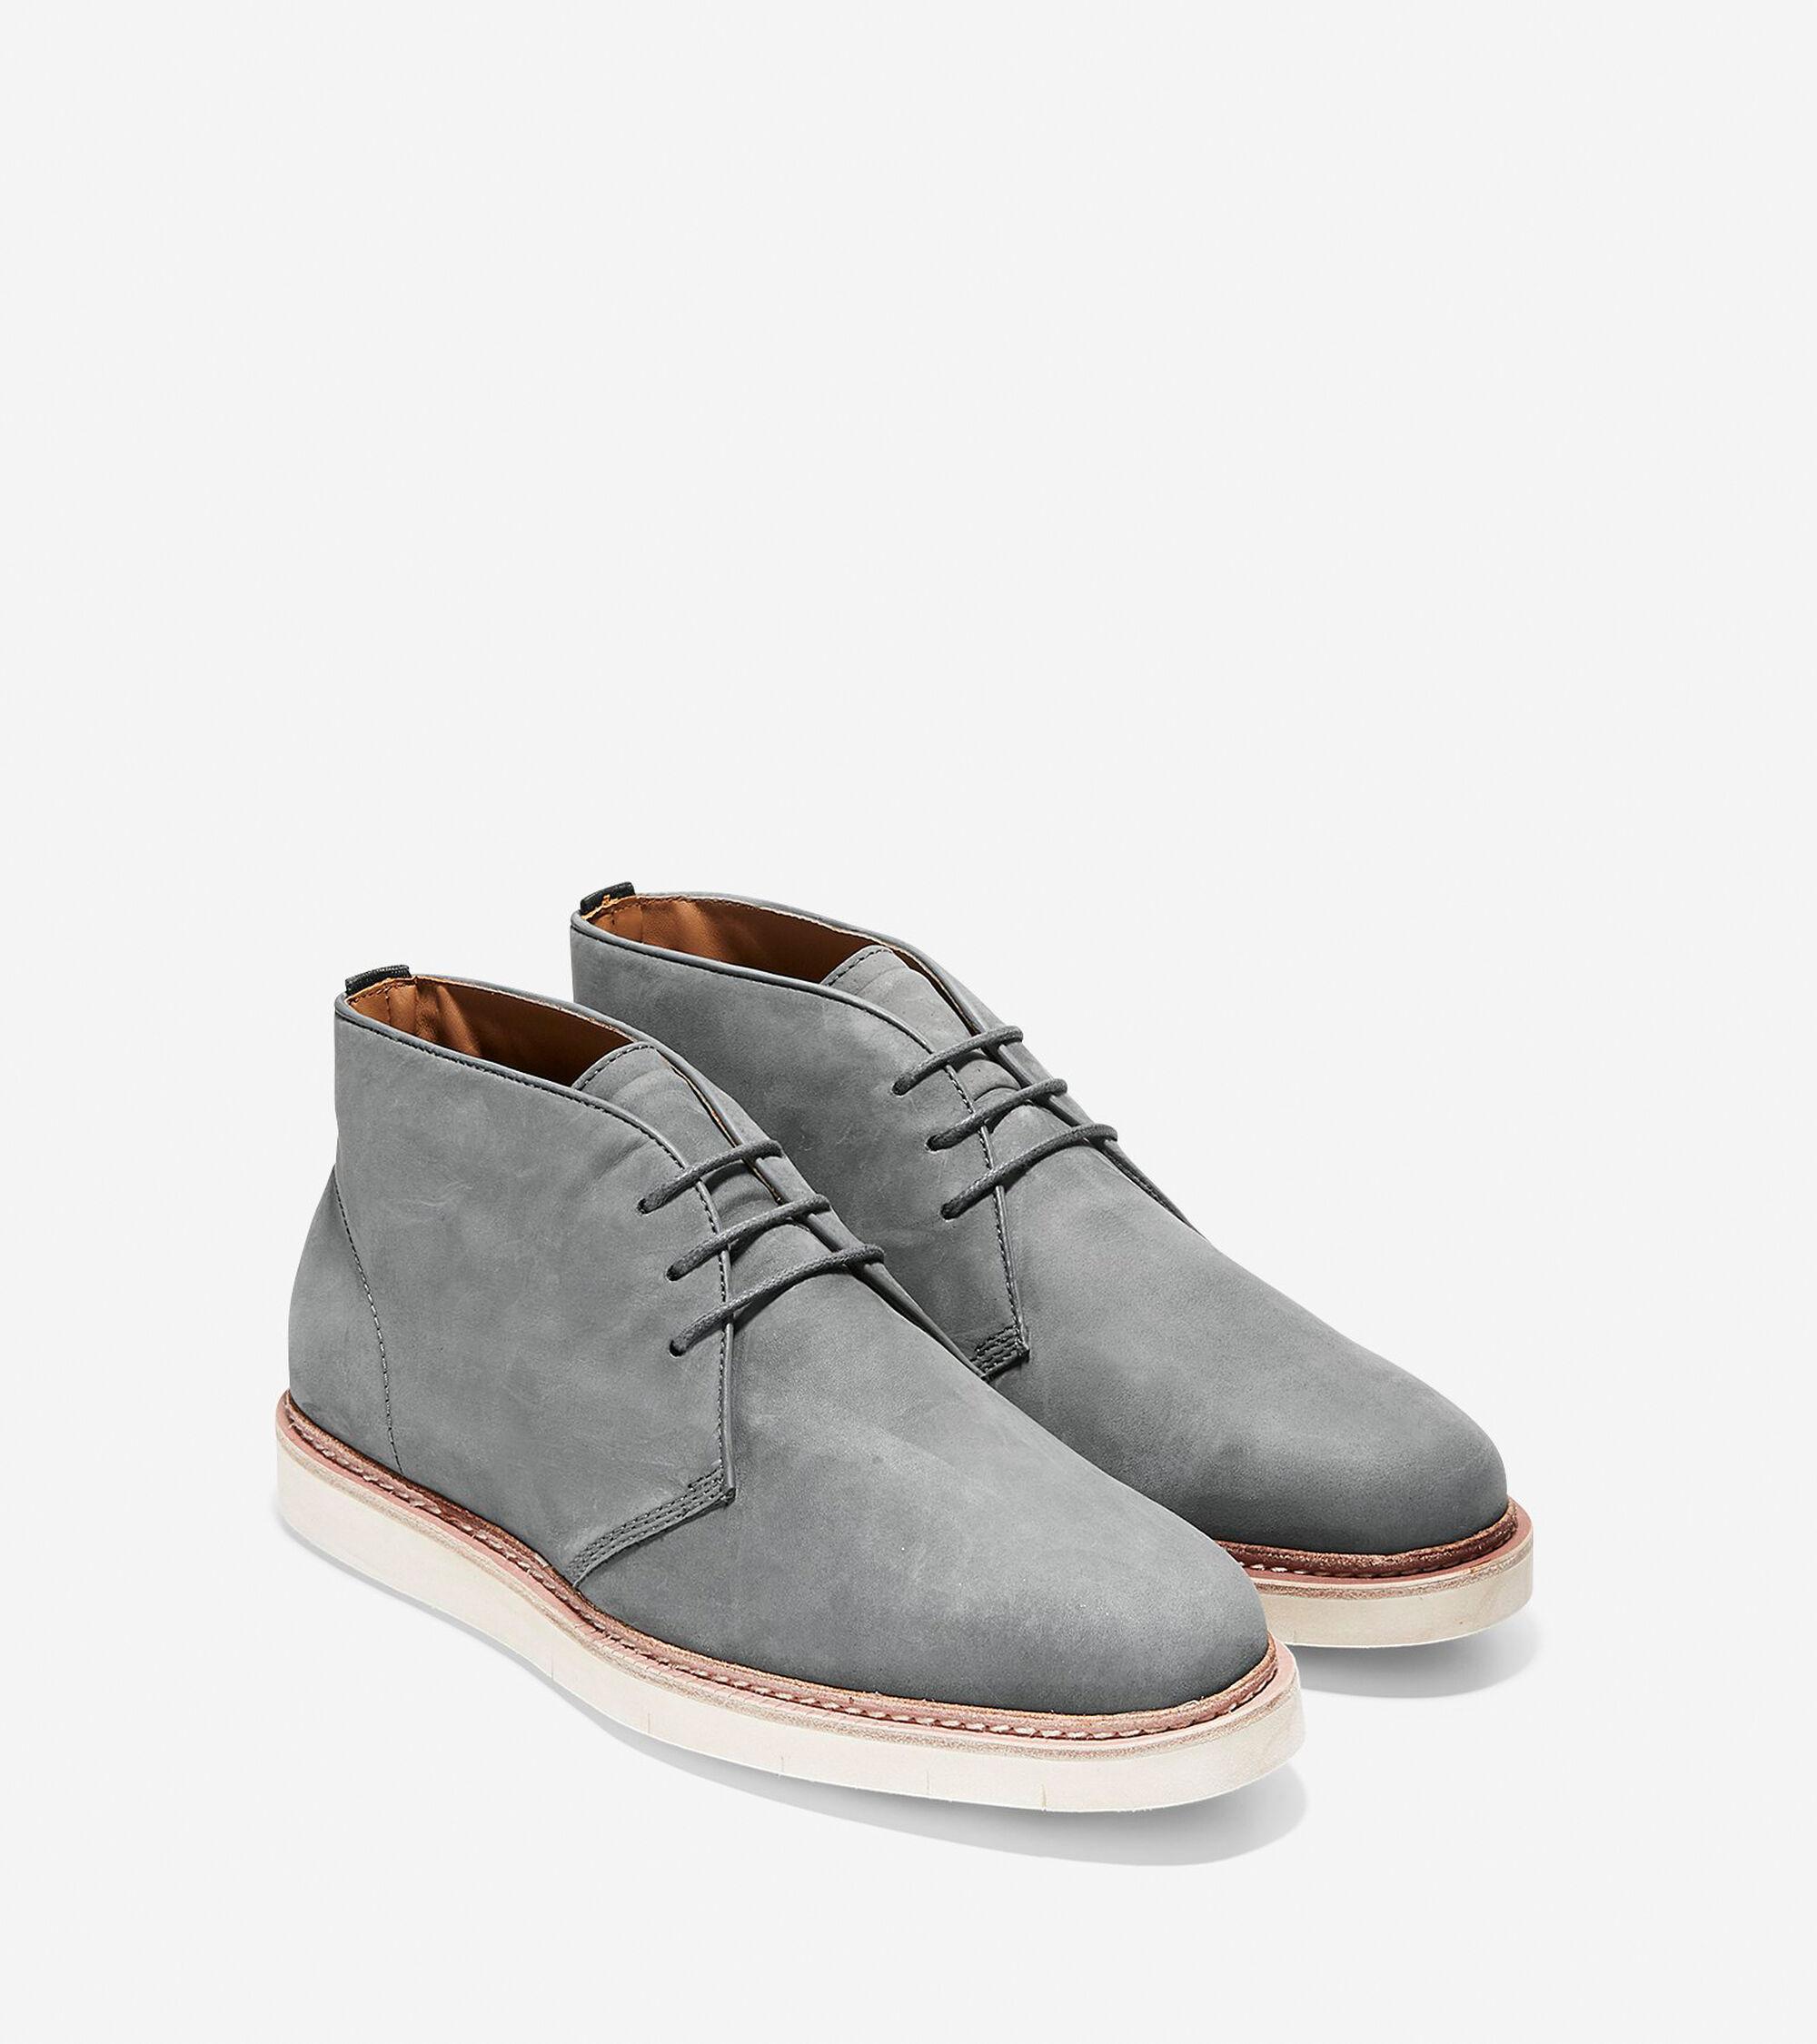 b1c04b74b78 Men s Tanner Chukka Boots in Magnet-Ivory